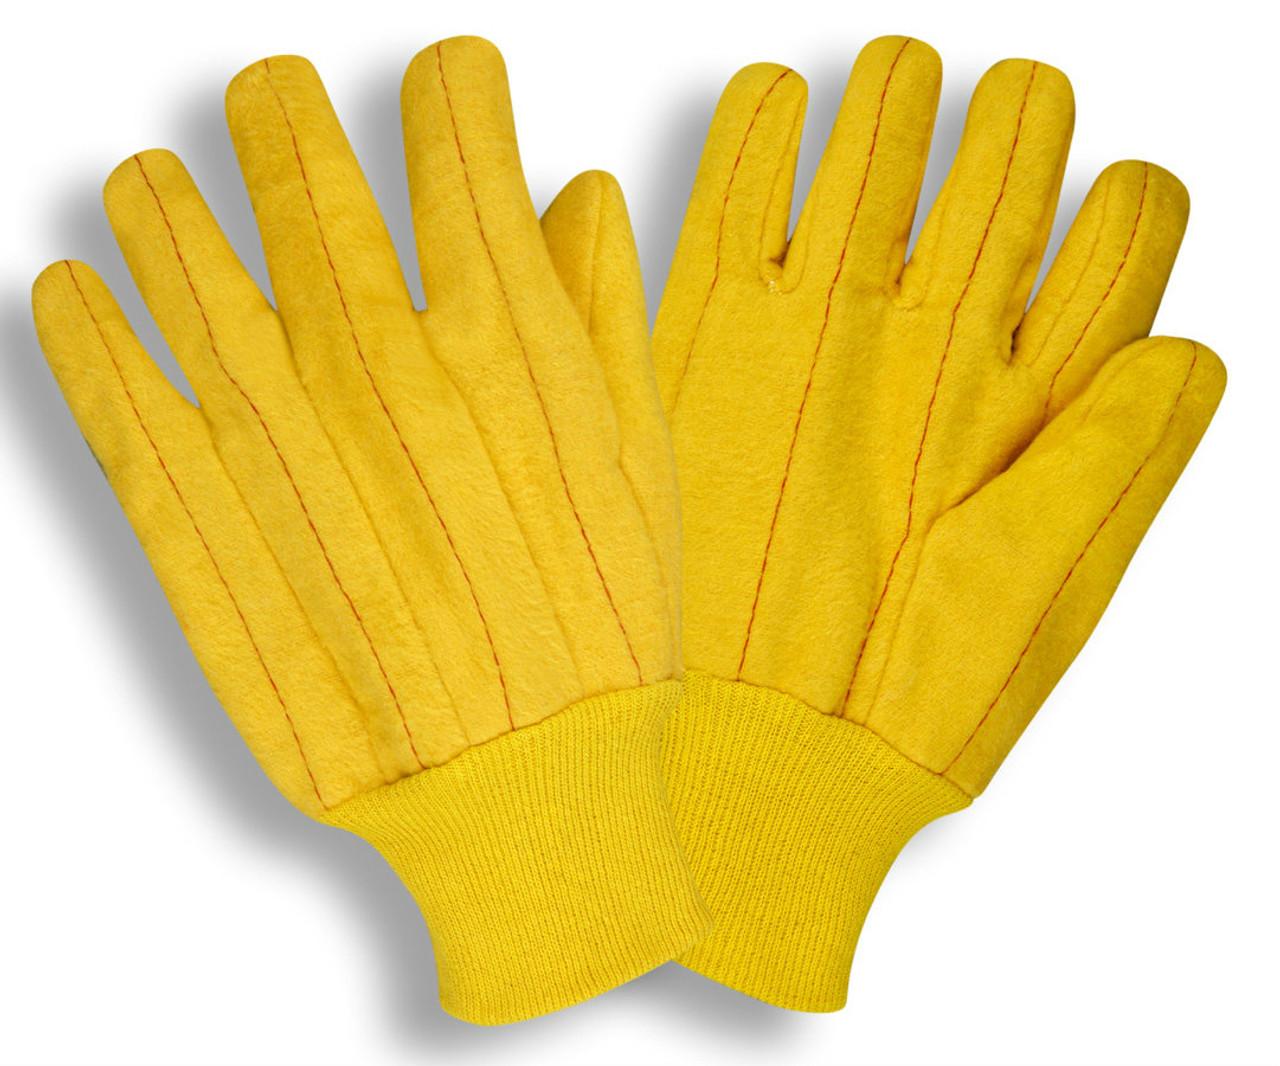 2318: Yellow Full Chore Gloves - 12 Pack